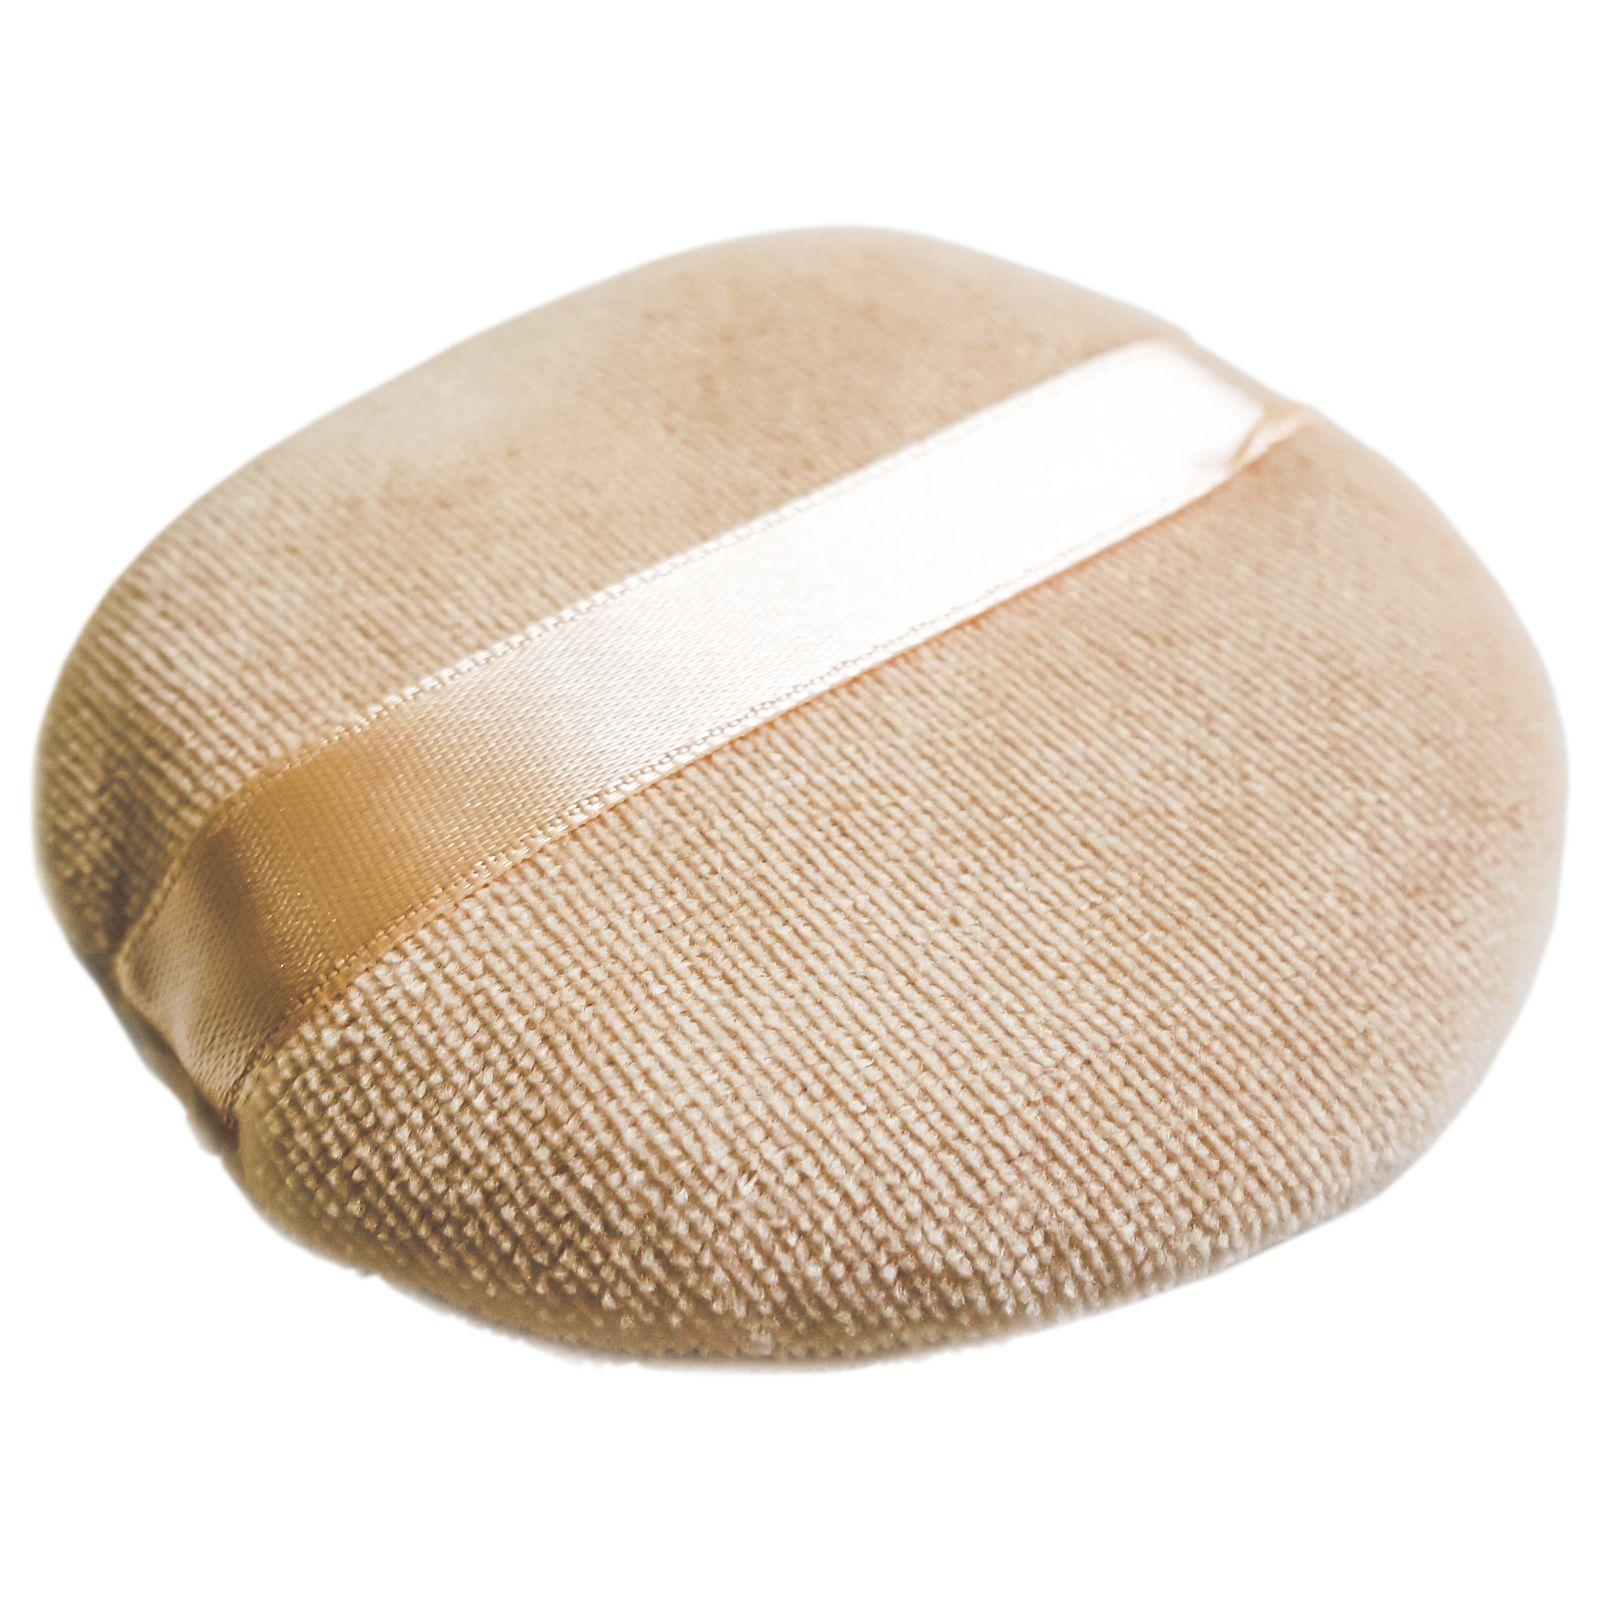 پد آرایشی نوا مدل Towel-01 -  - 2